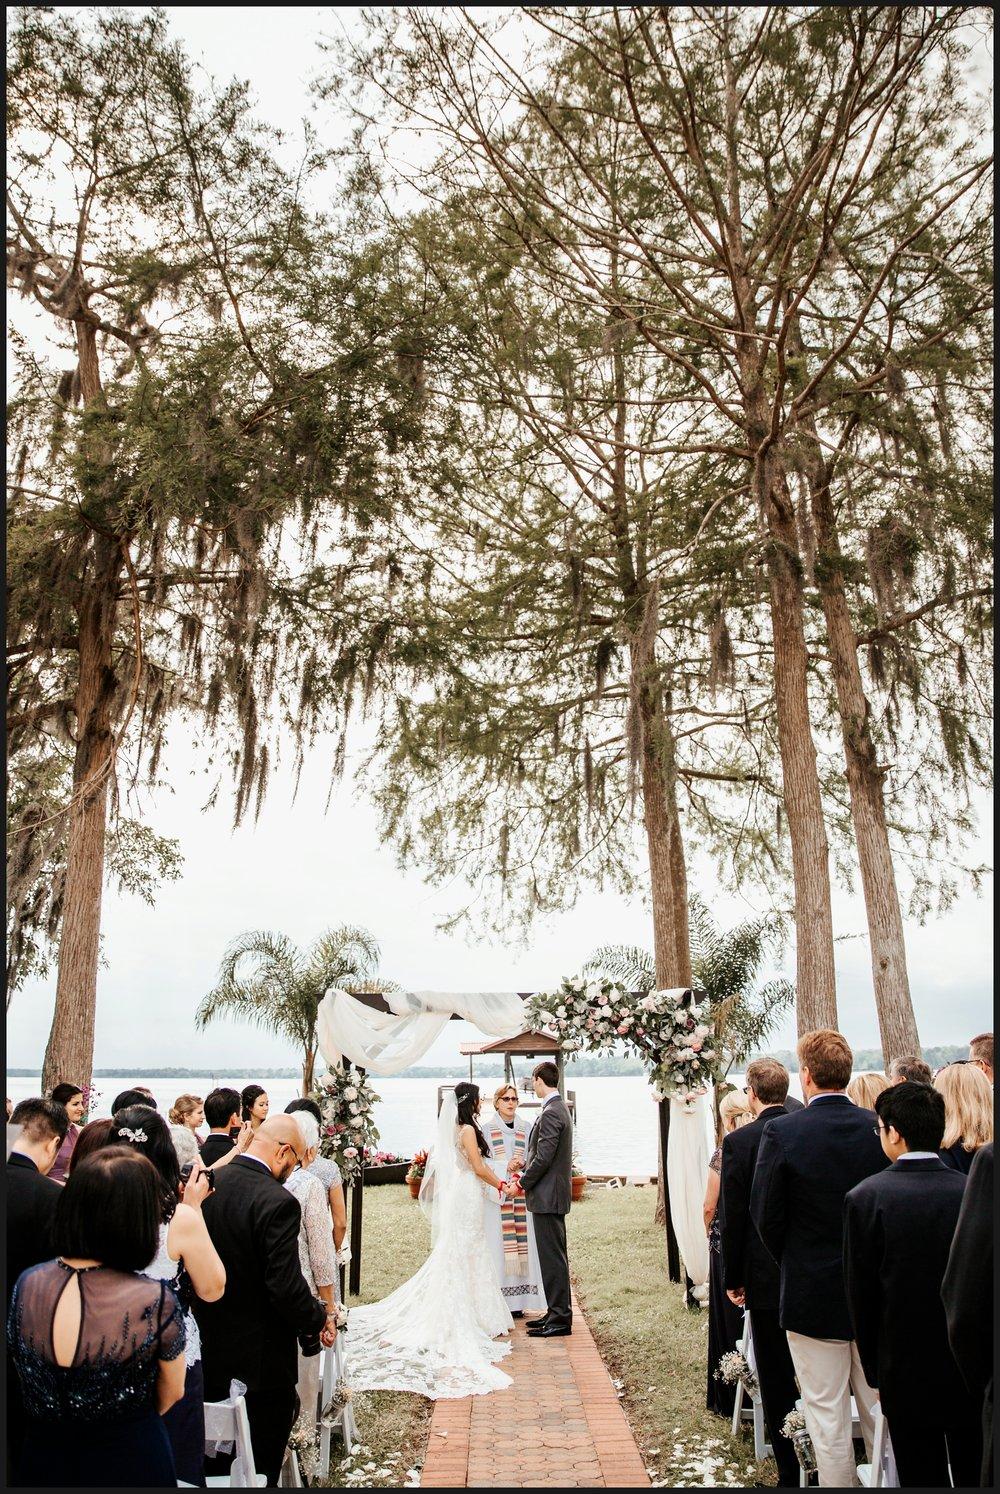 Orlando-Wedding-Photographer-destination-wedding-photographer-florida-wedding-photographer-bohemian-wedding-photographer_1425.jpg